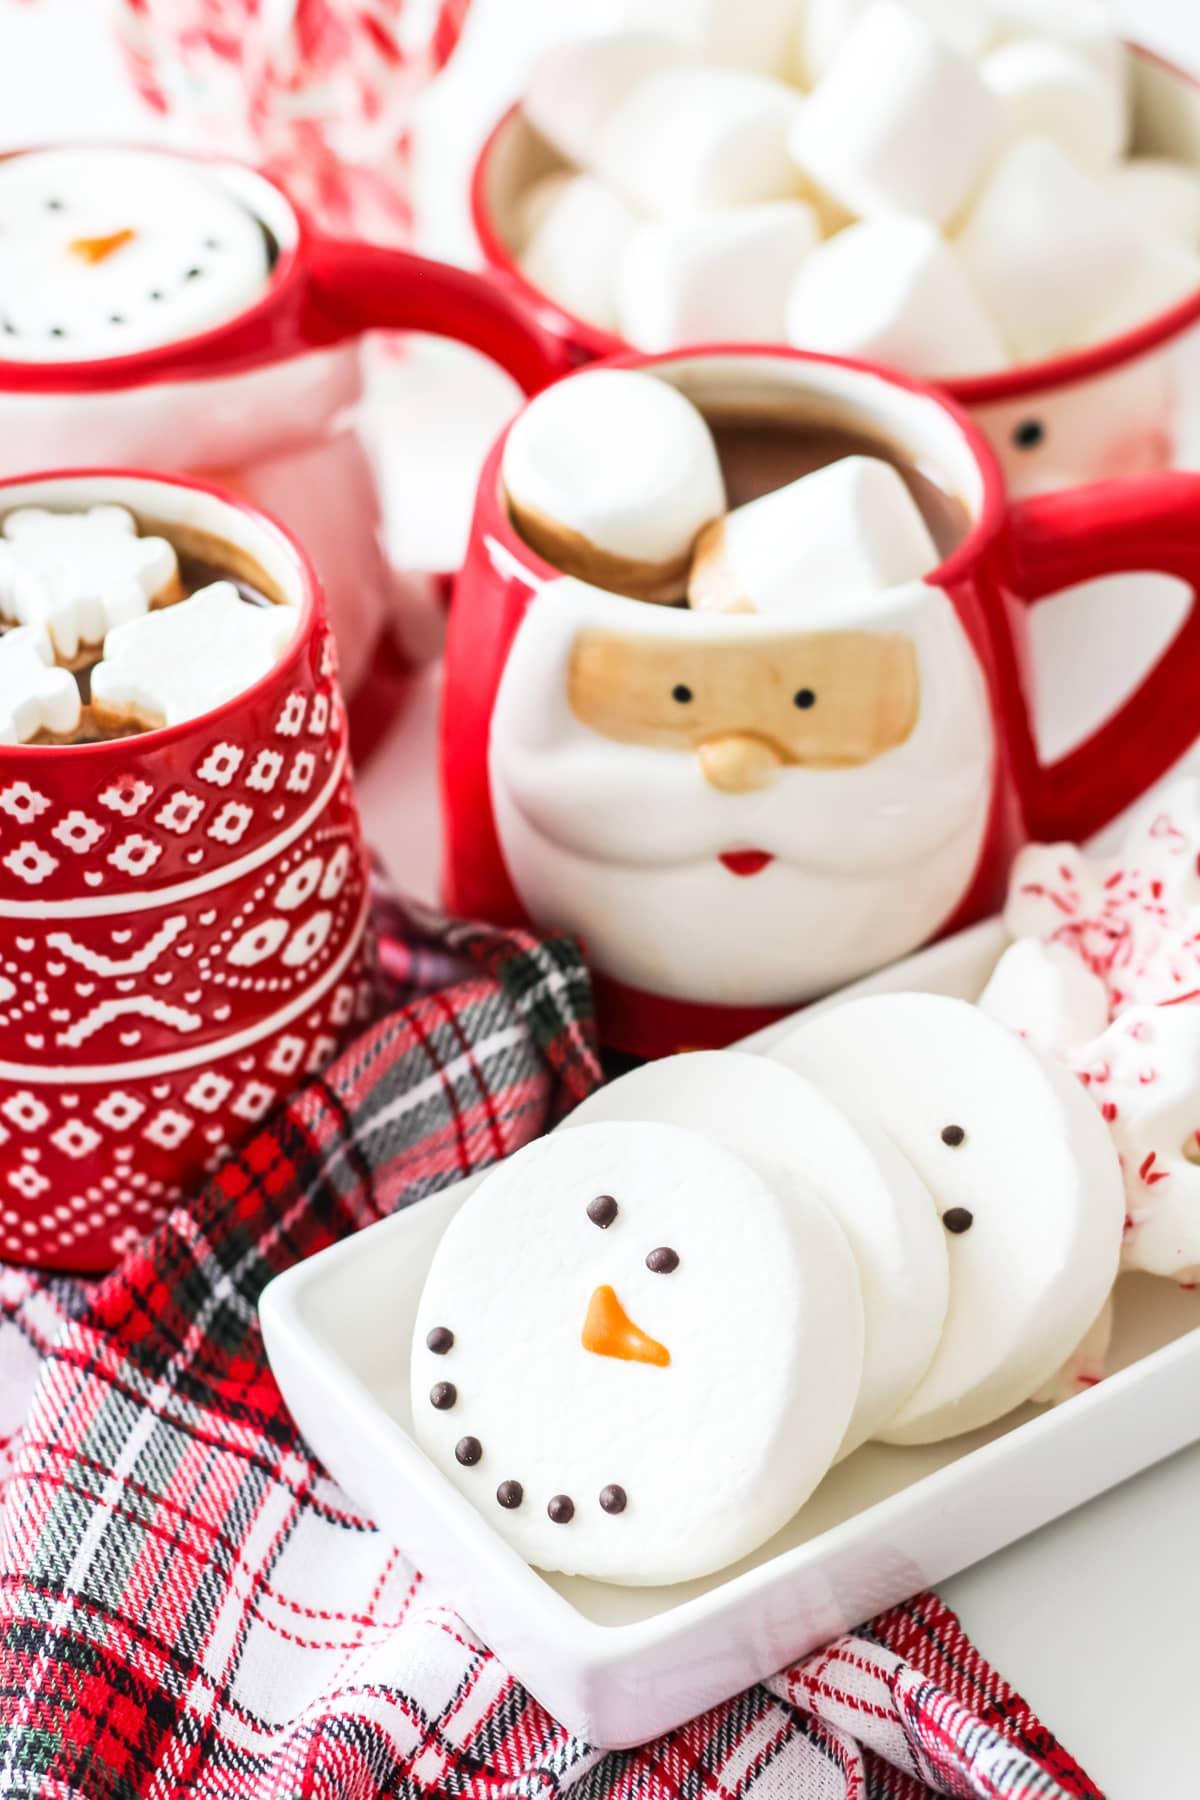 Snowman face marshmallows